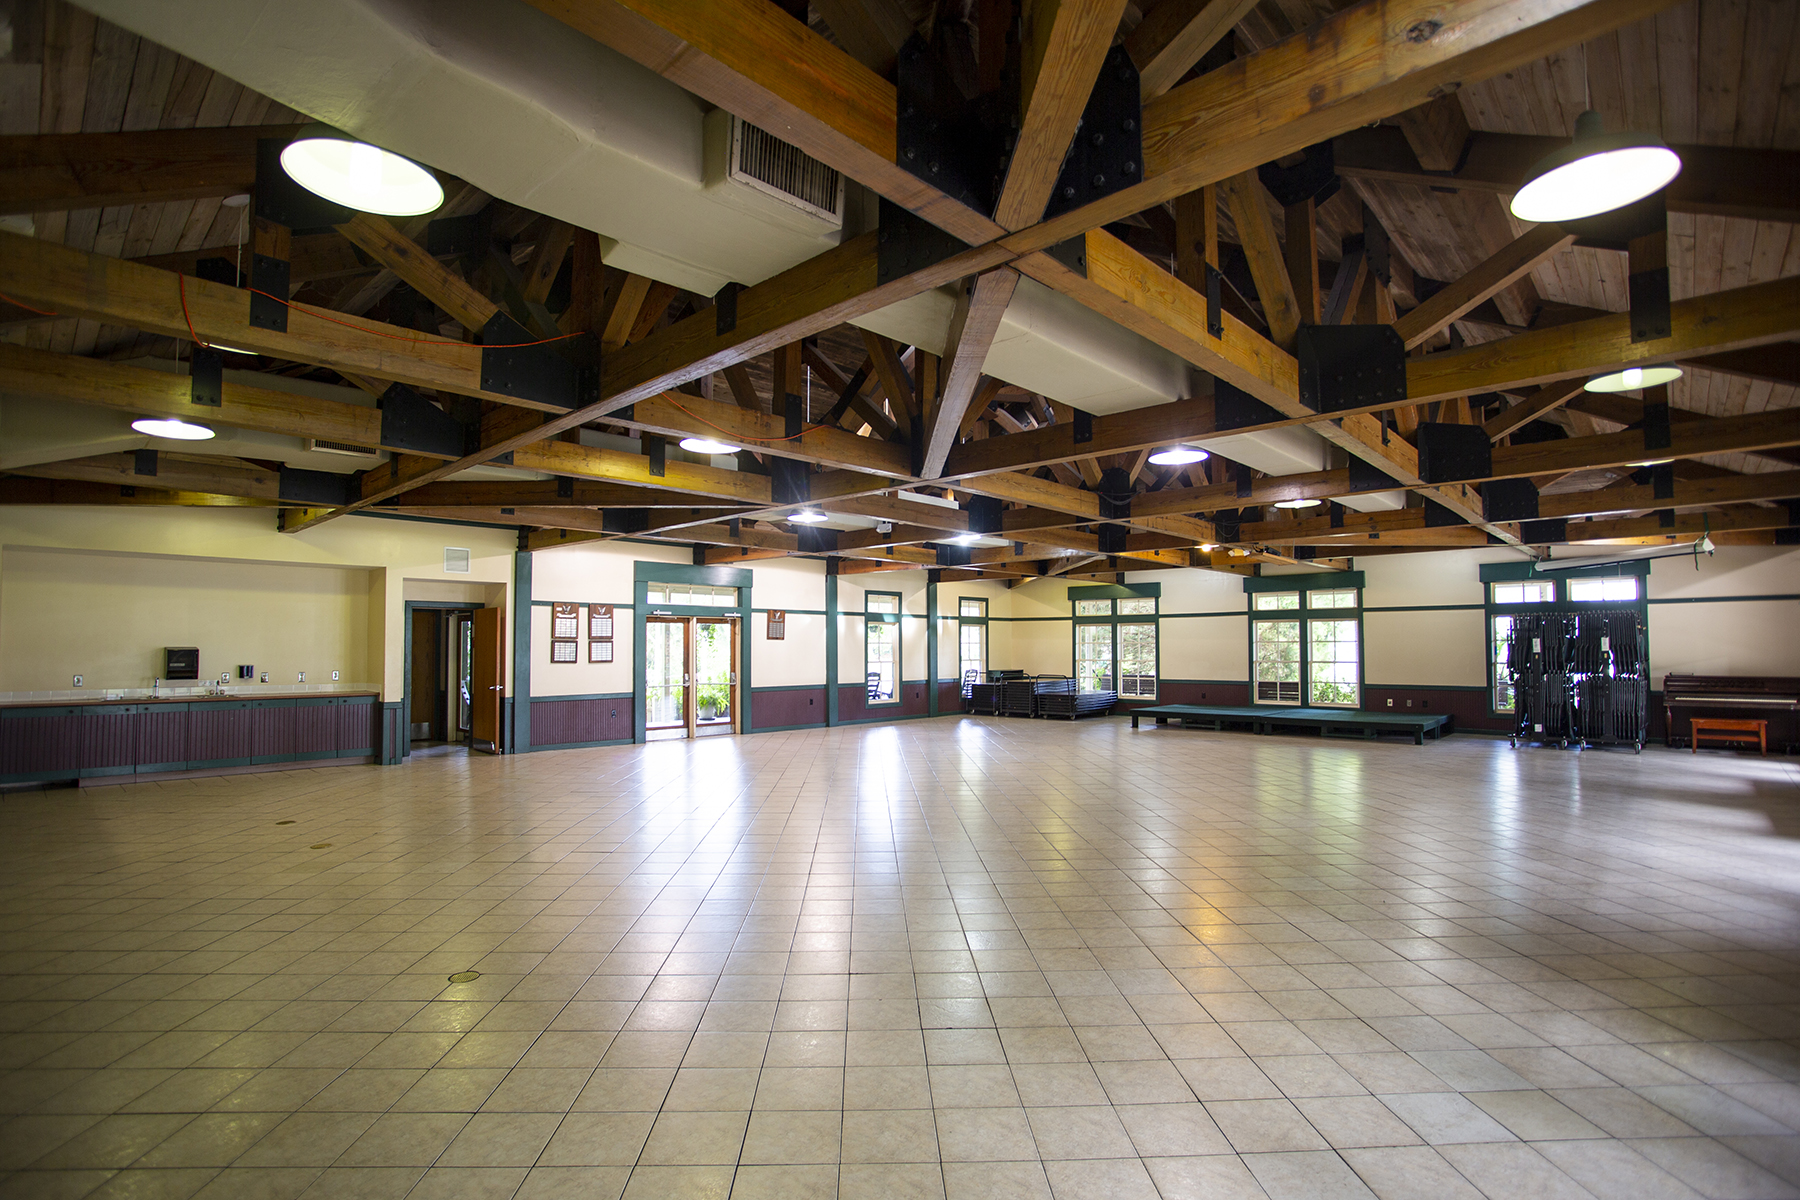 Kramer Dining Hall - Camp and Retreat